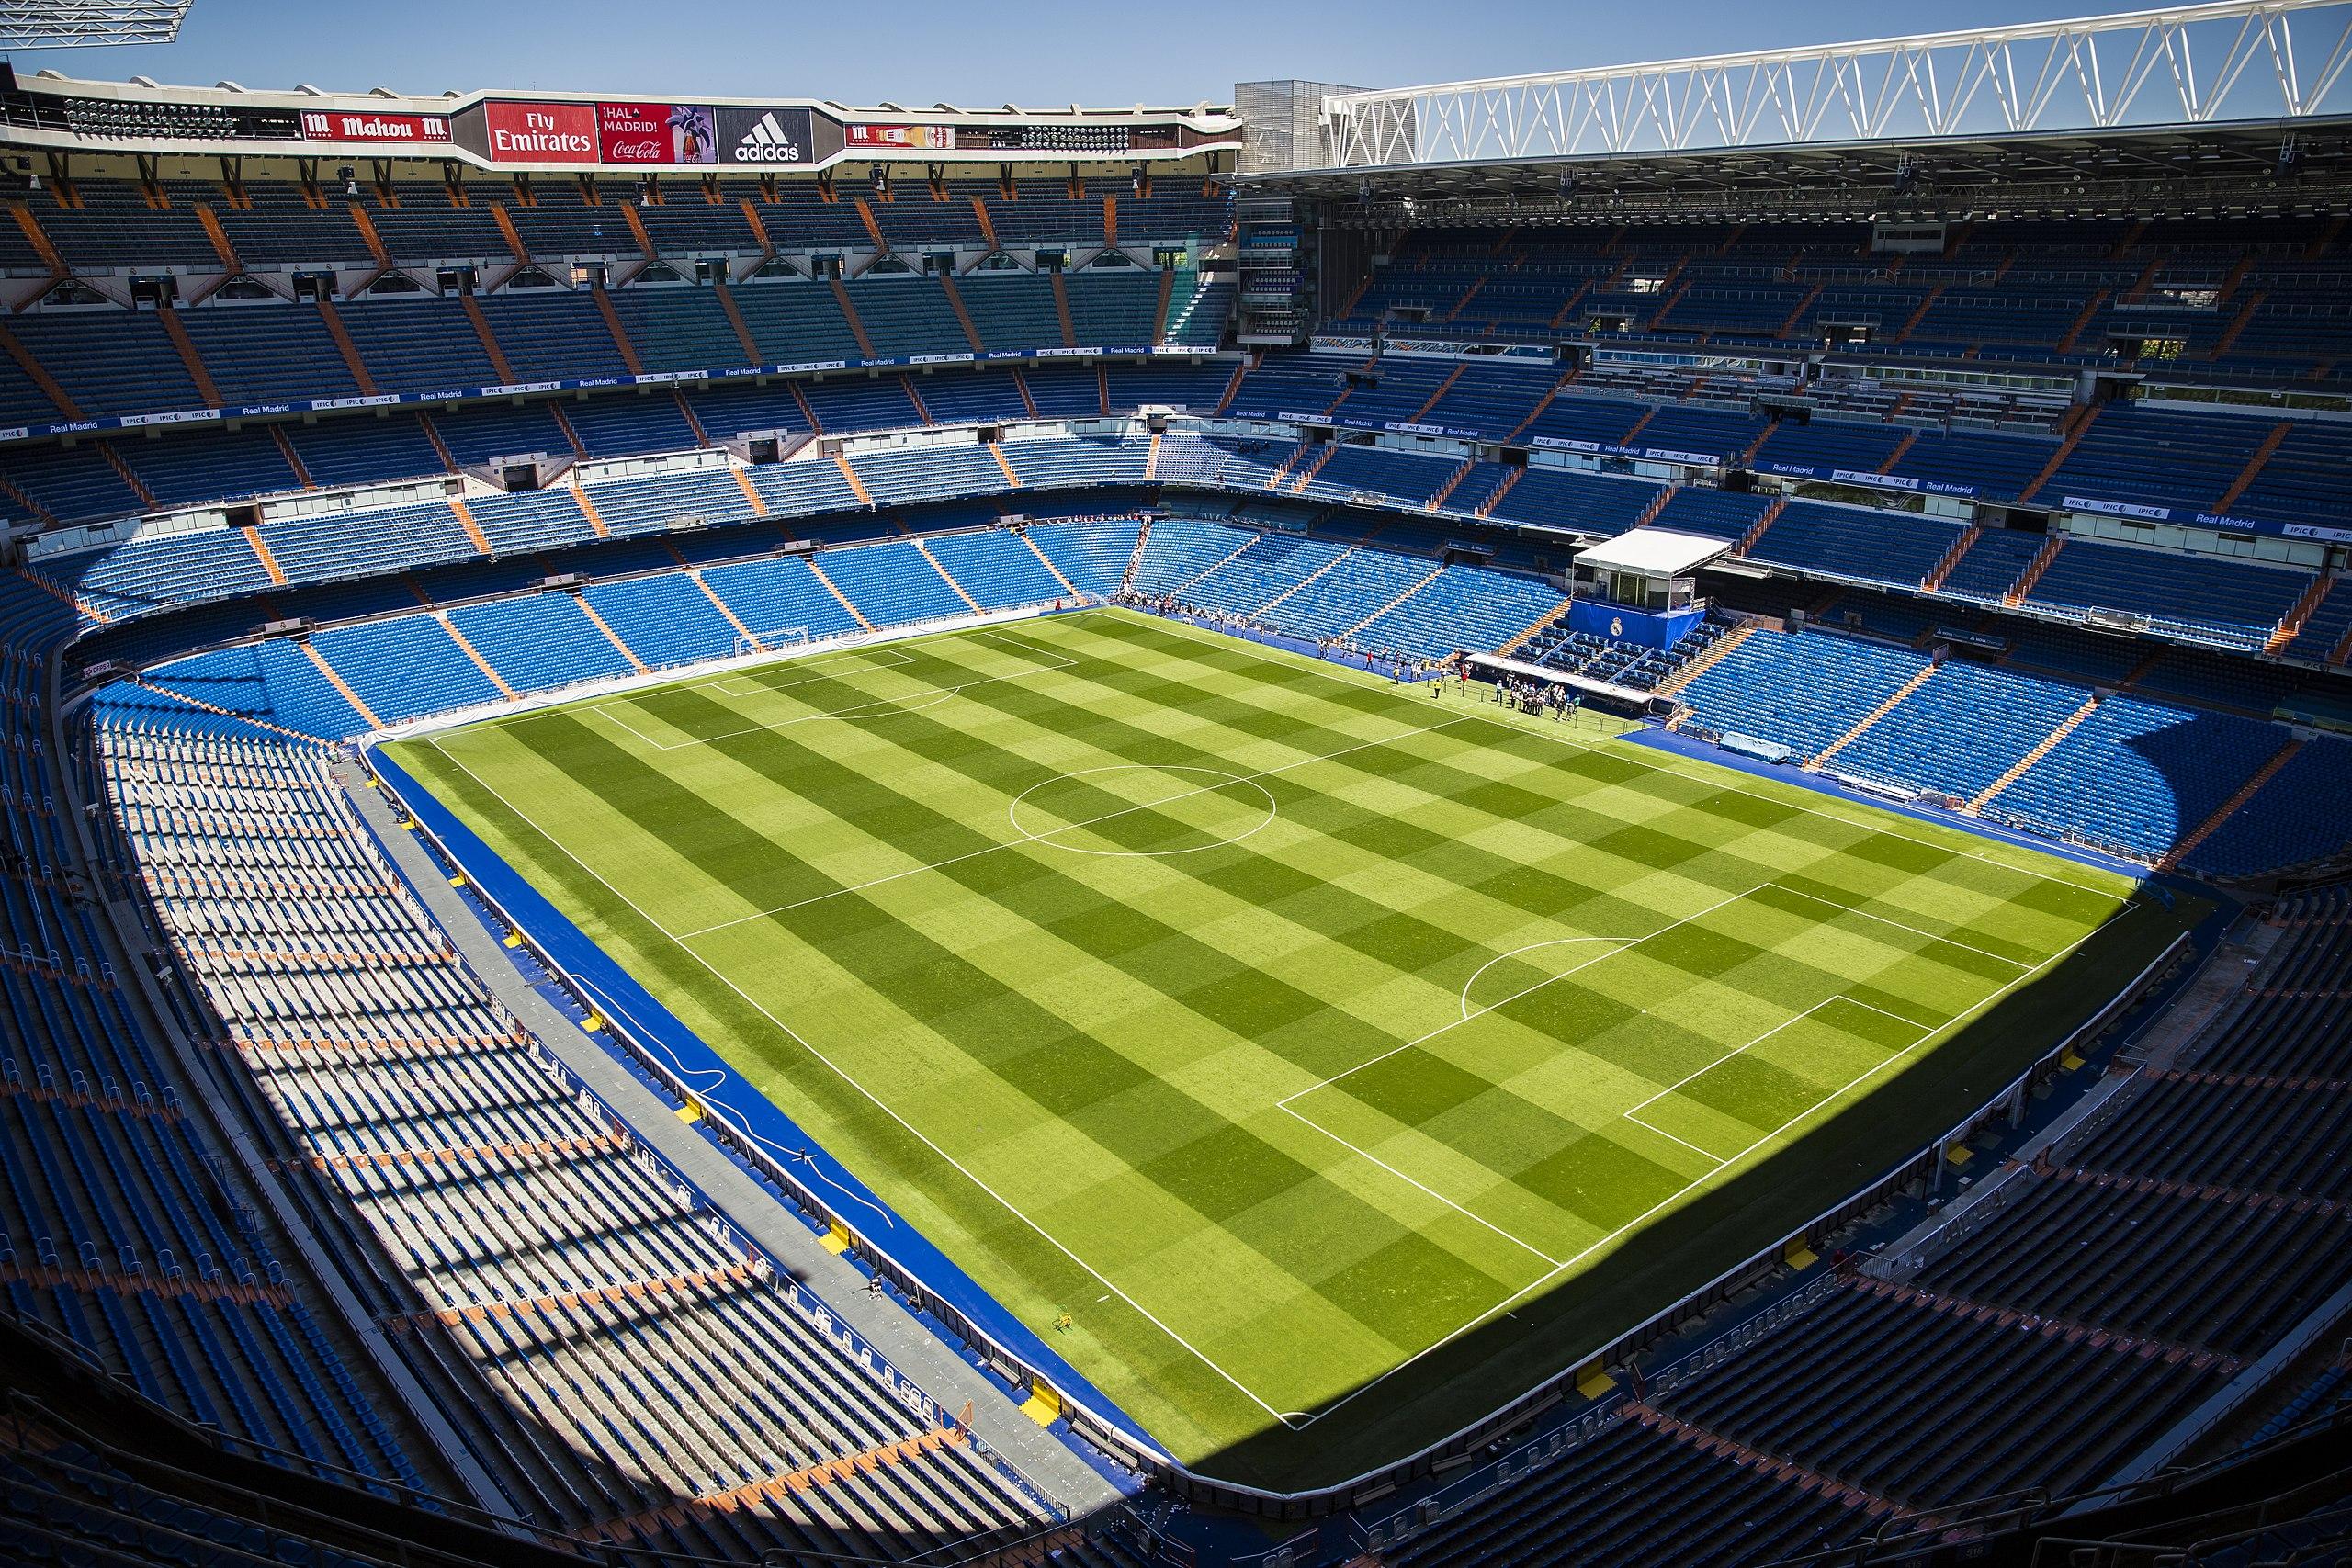 File:City of Madrid (17416373154).jpg - Wikimedia Commons